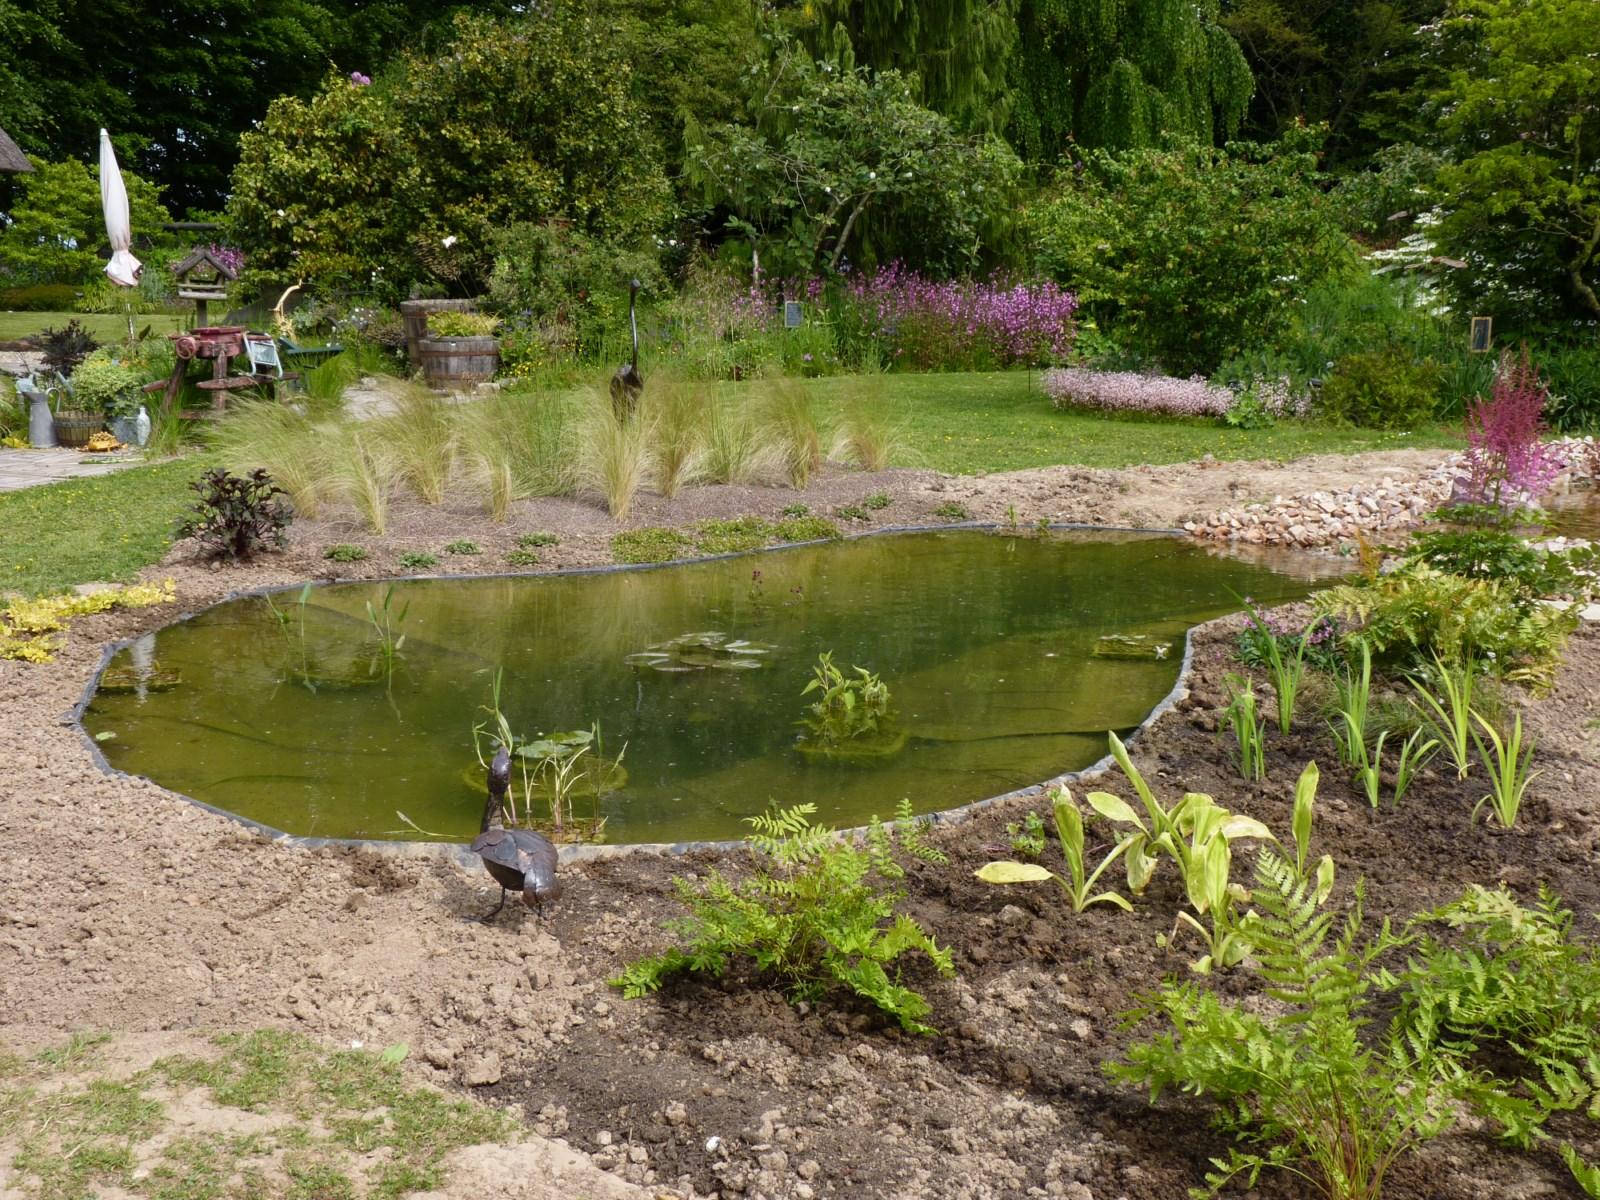 le bassin aquatique dans votre jardin grézieu la varenne